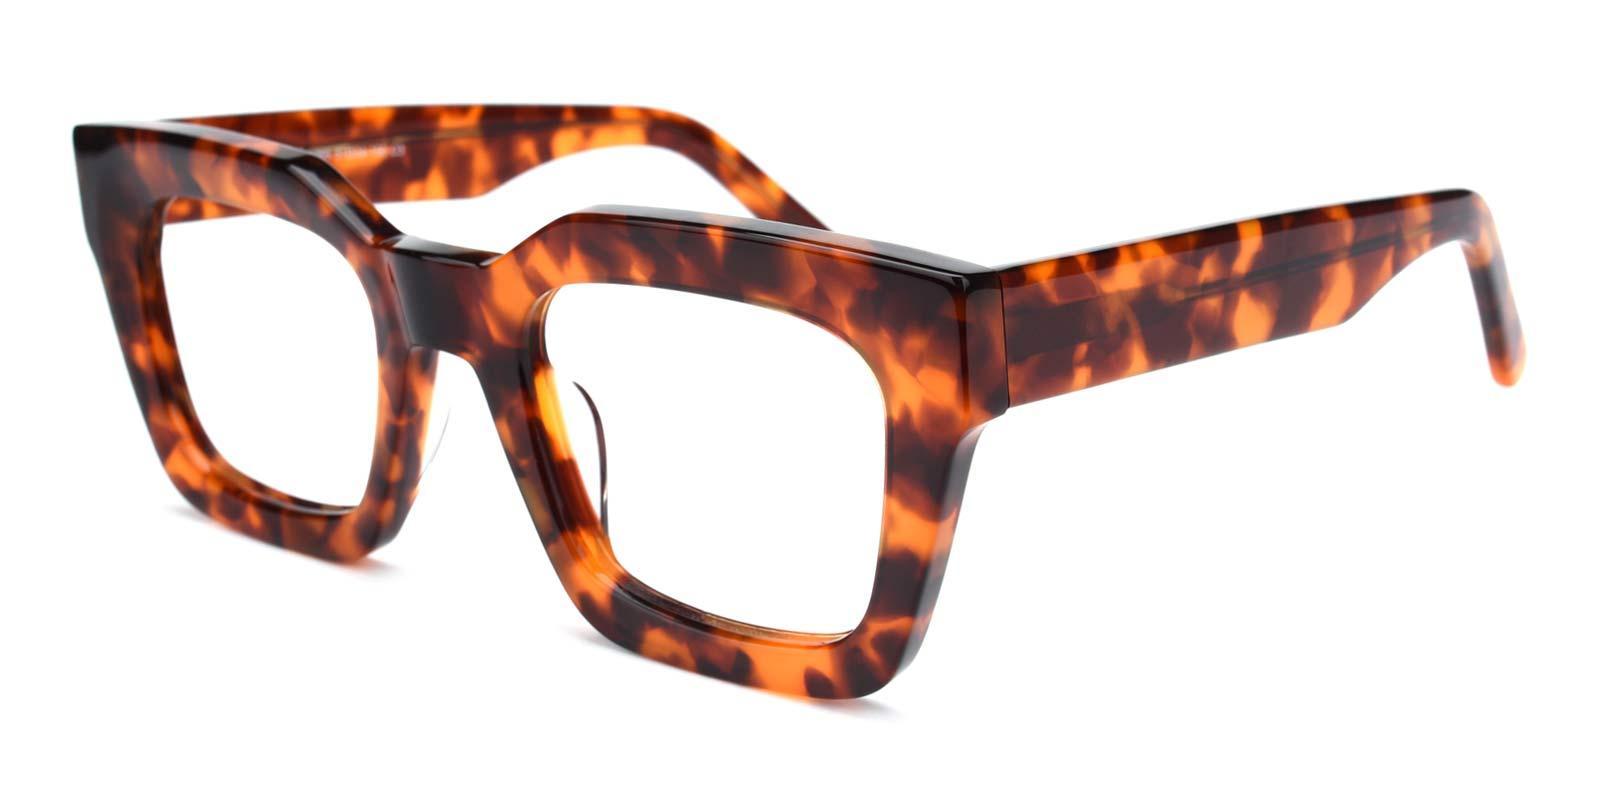 Esther-Tortoise-Geometric-Acetate-Eyeglasses-additional1